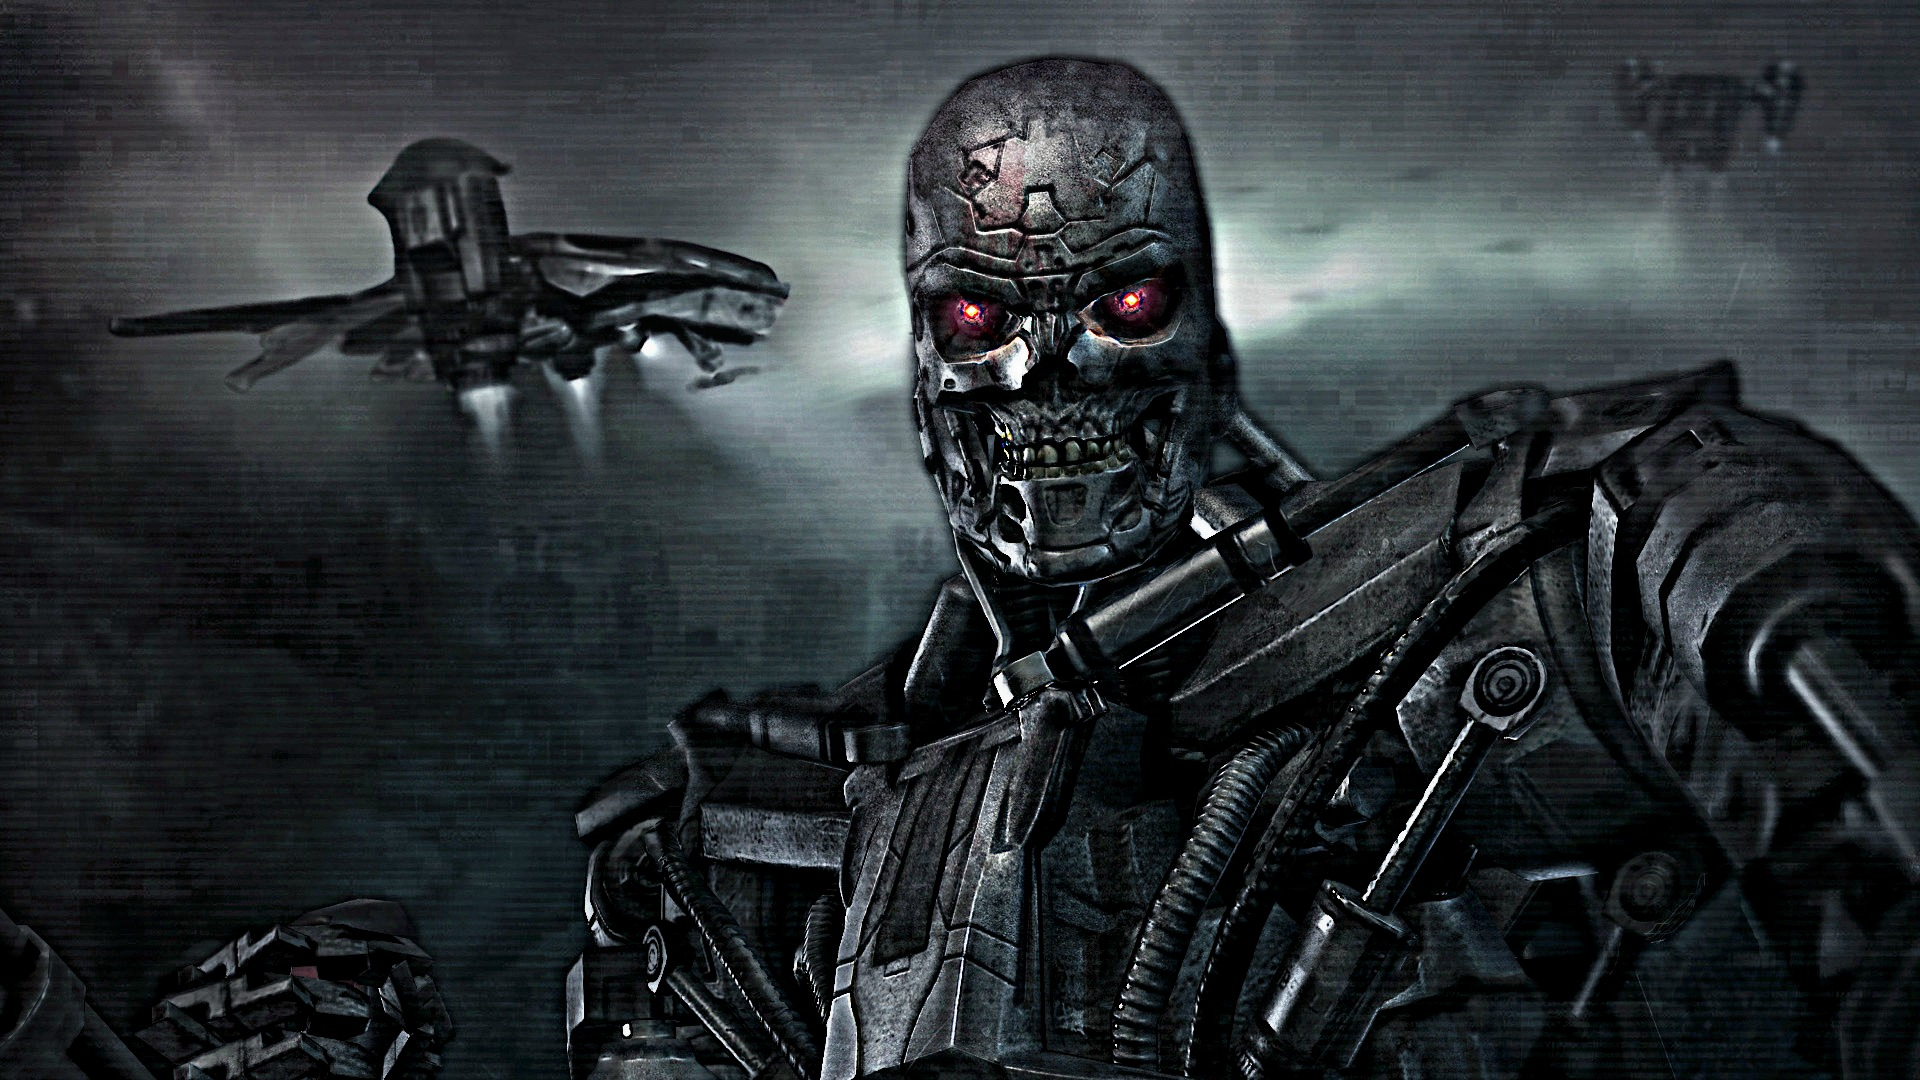 Terminator hd wallpaper background image 1920x1080 id 196999 wallpaper abyss - Terminator 2 wallpaper hd ...